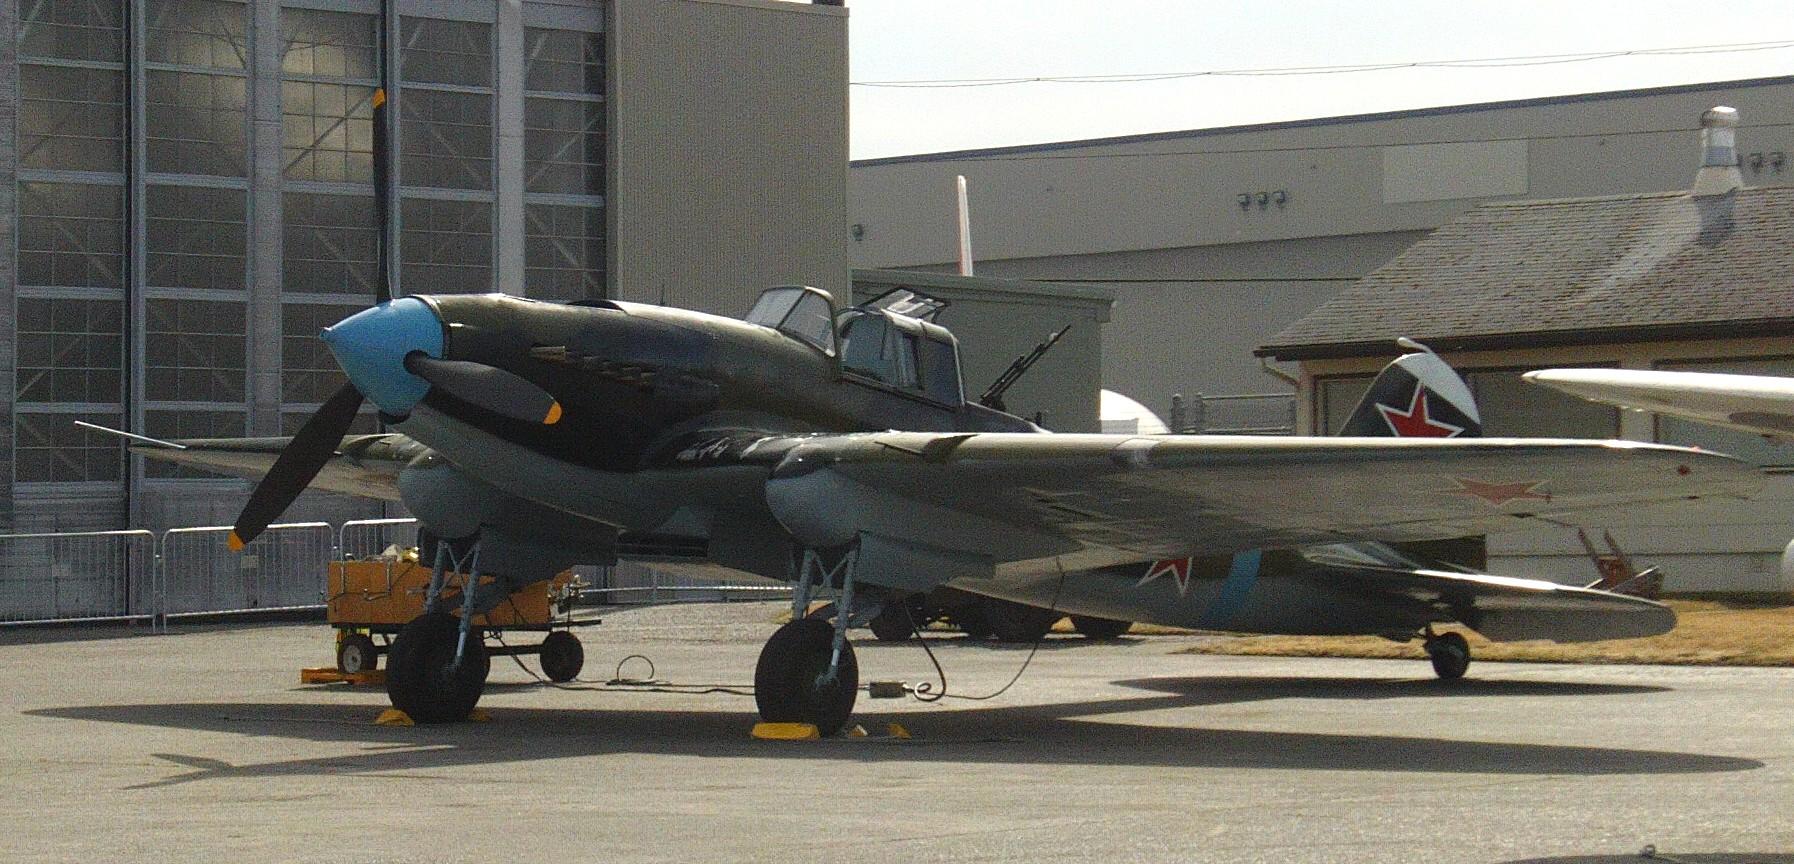 Ilyushin_Il-2m3_Shturmovik_-_Paine_Field